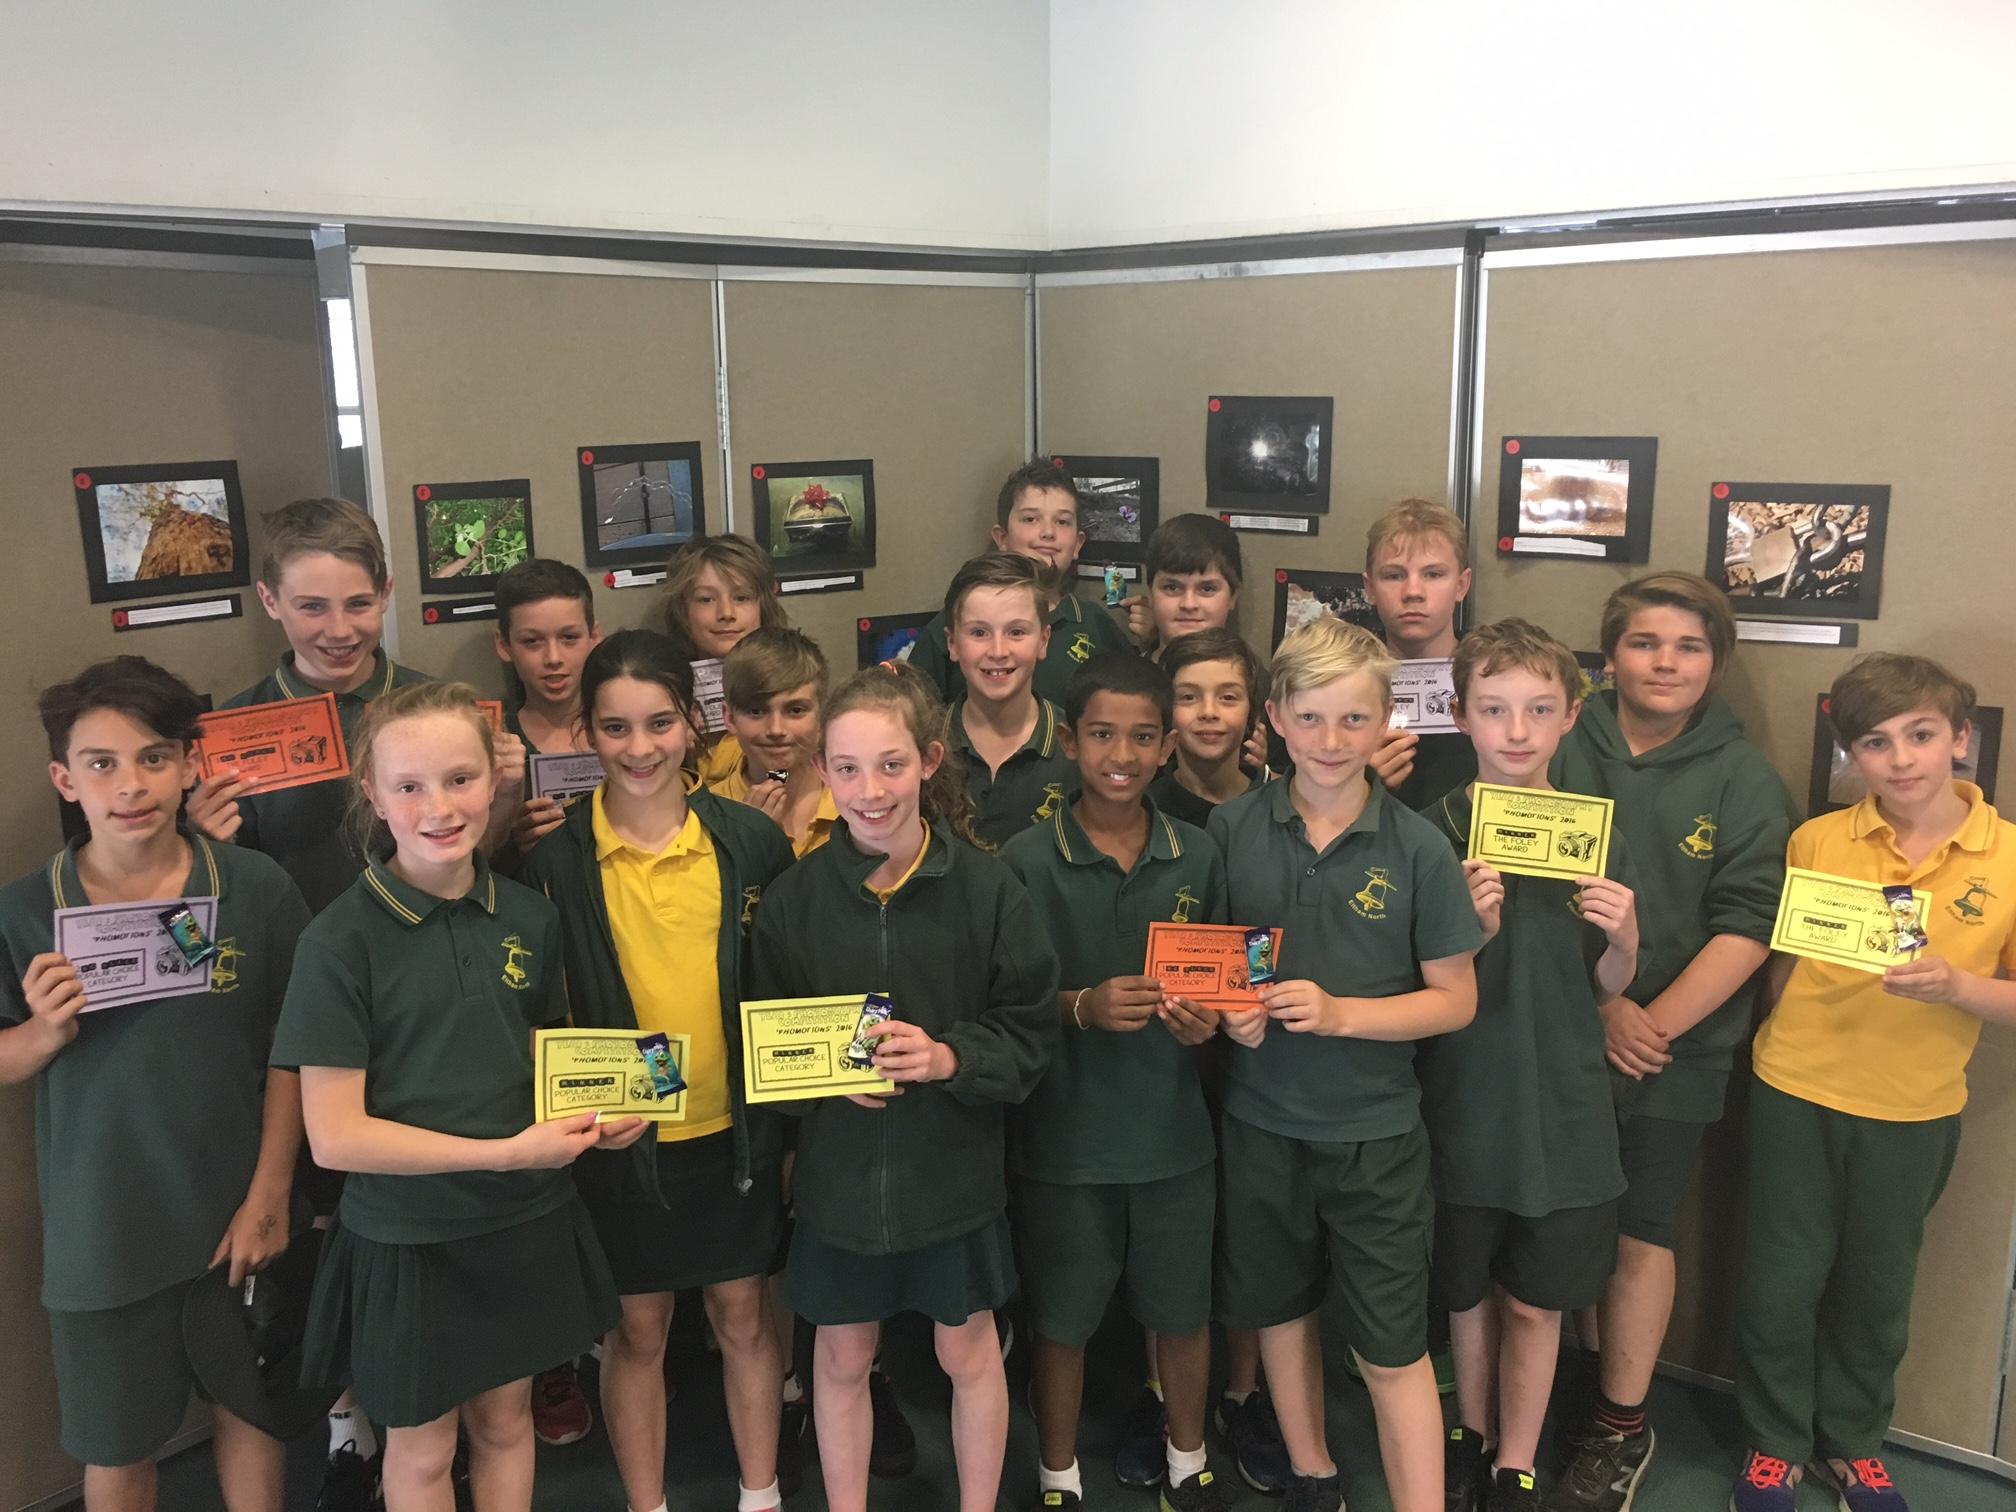 Our award winners